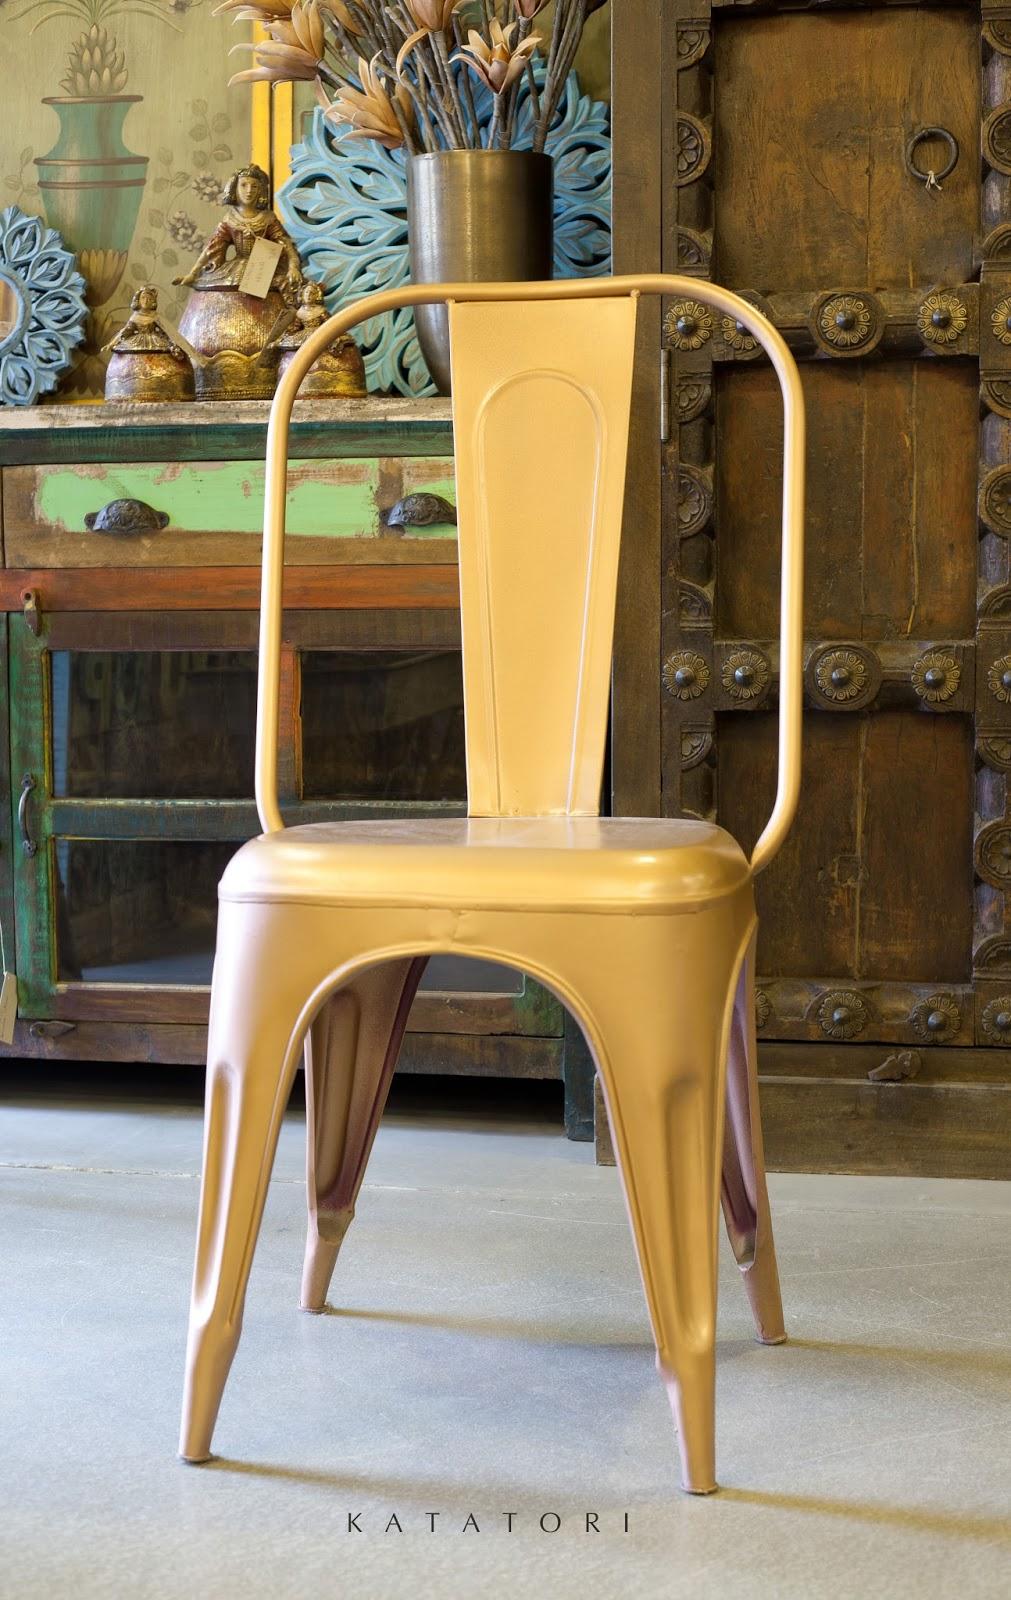 Katatori interiores mobiliario de estilo industrial para - Mobiliario estilo industrial ...